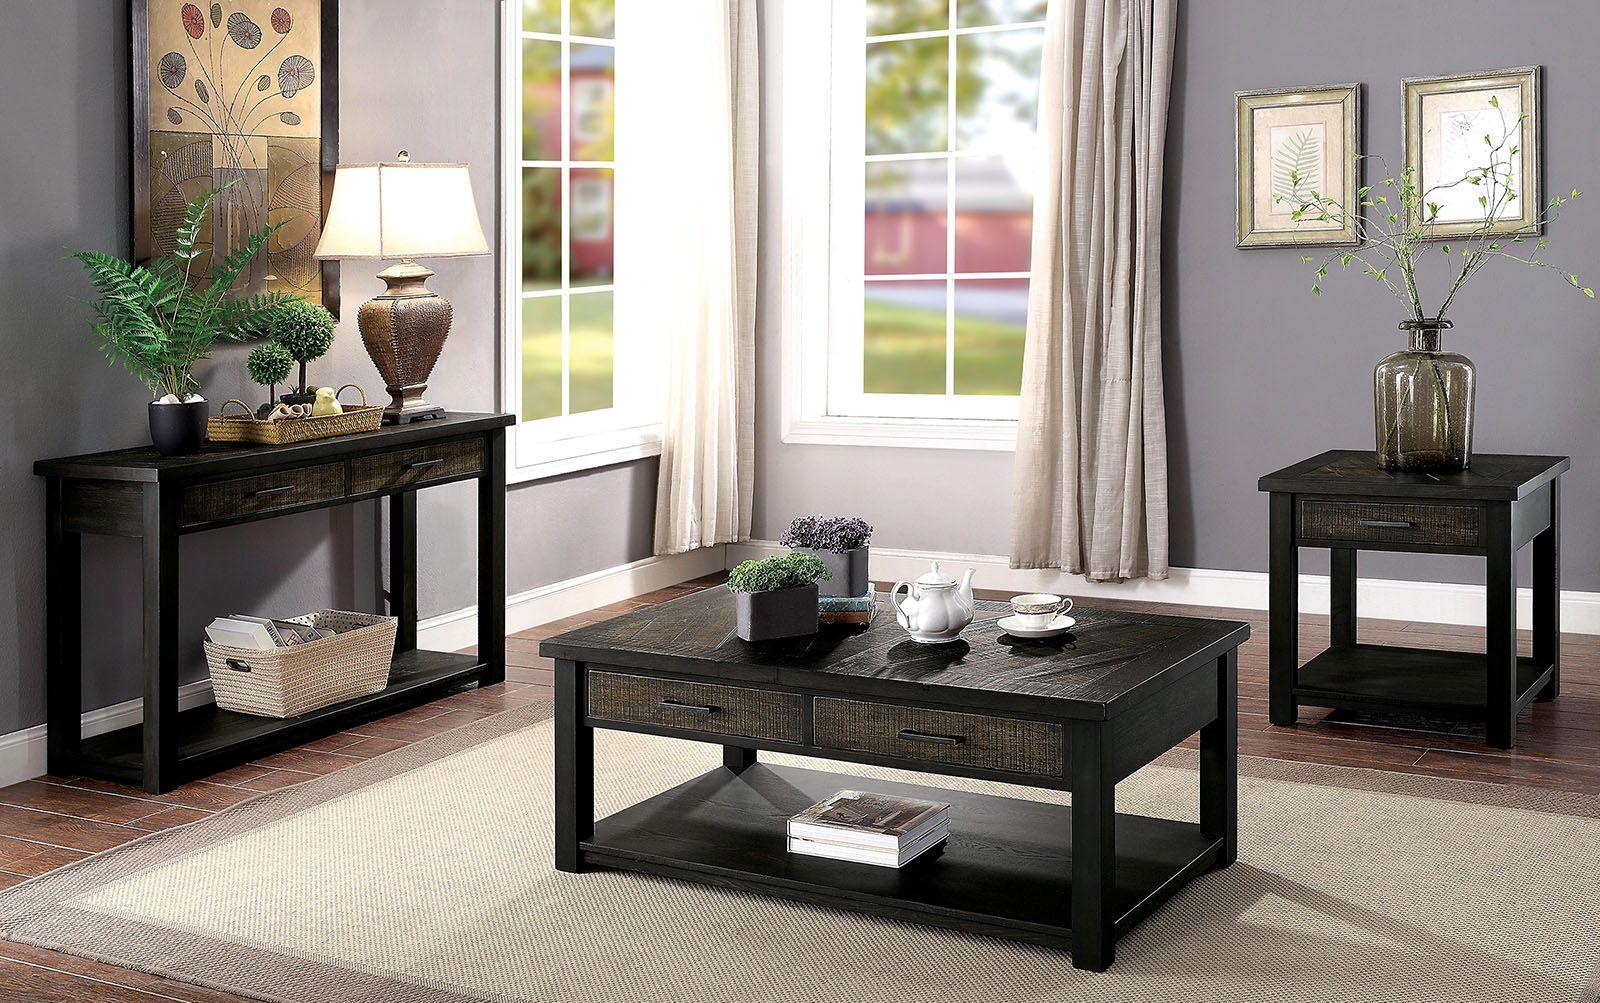 Rhymney Coffee Table Cm4123c Furniture Of America Coffee Tables In 2021 Living Room Table Sets Coffee Table 3 Piece Coffee Table Set [ 1003 x 1600 Pixel ]